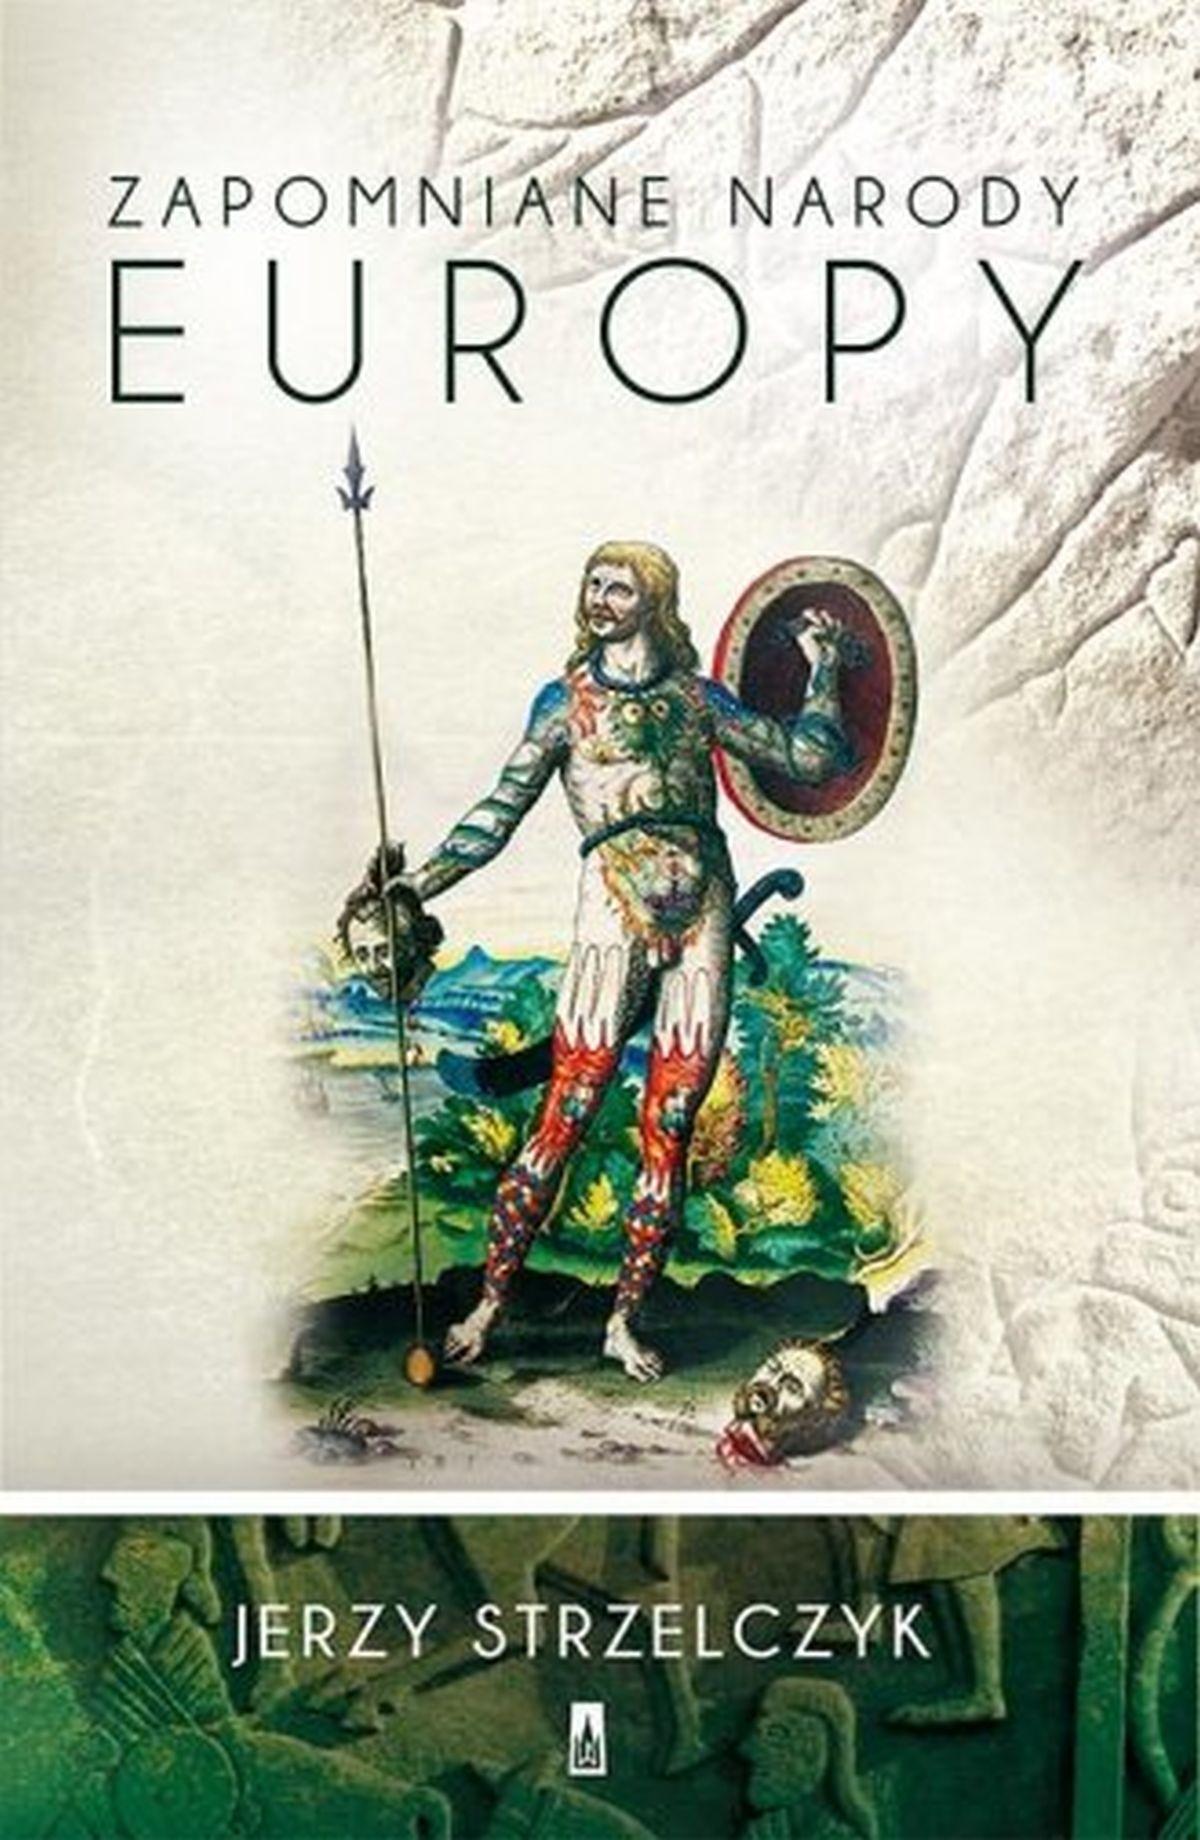 Zapomniane narody Europy